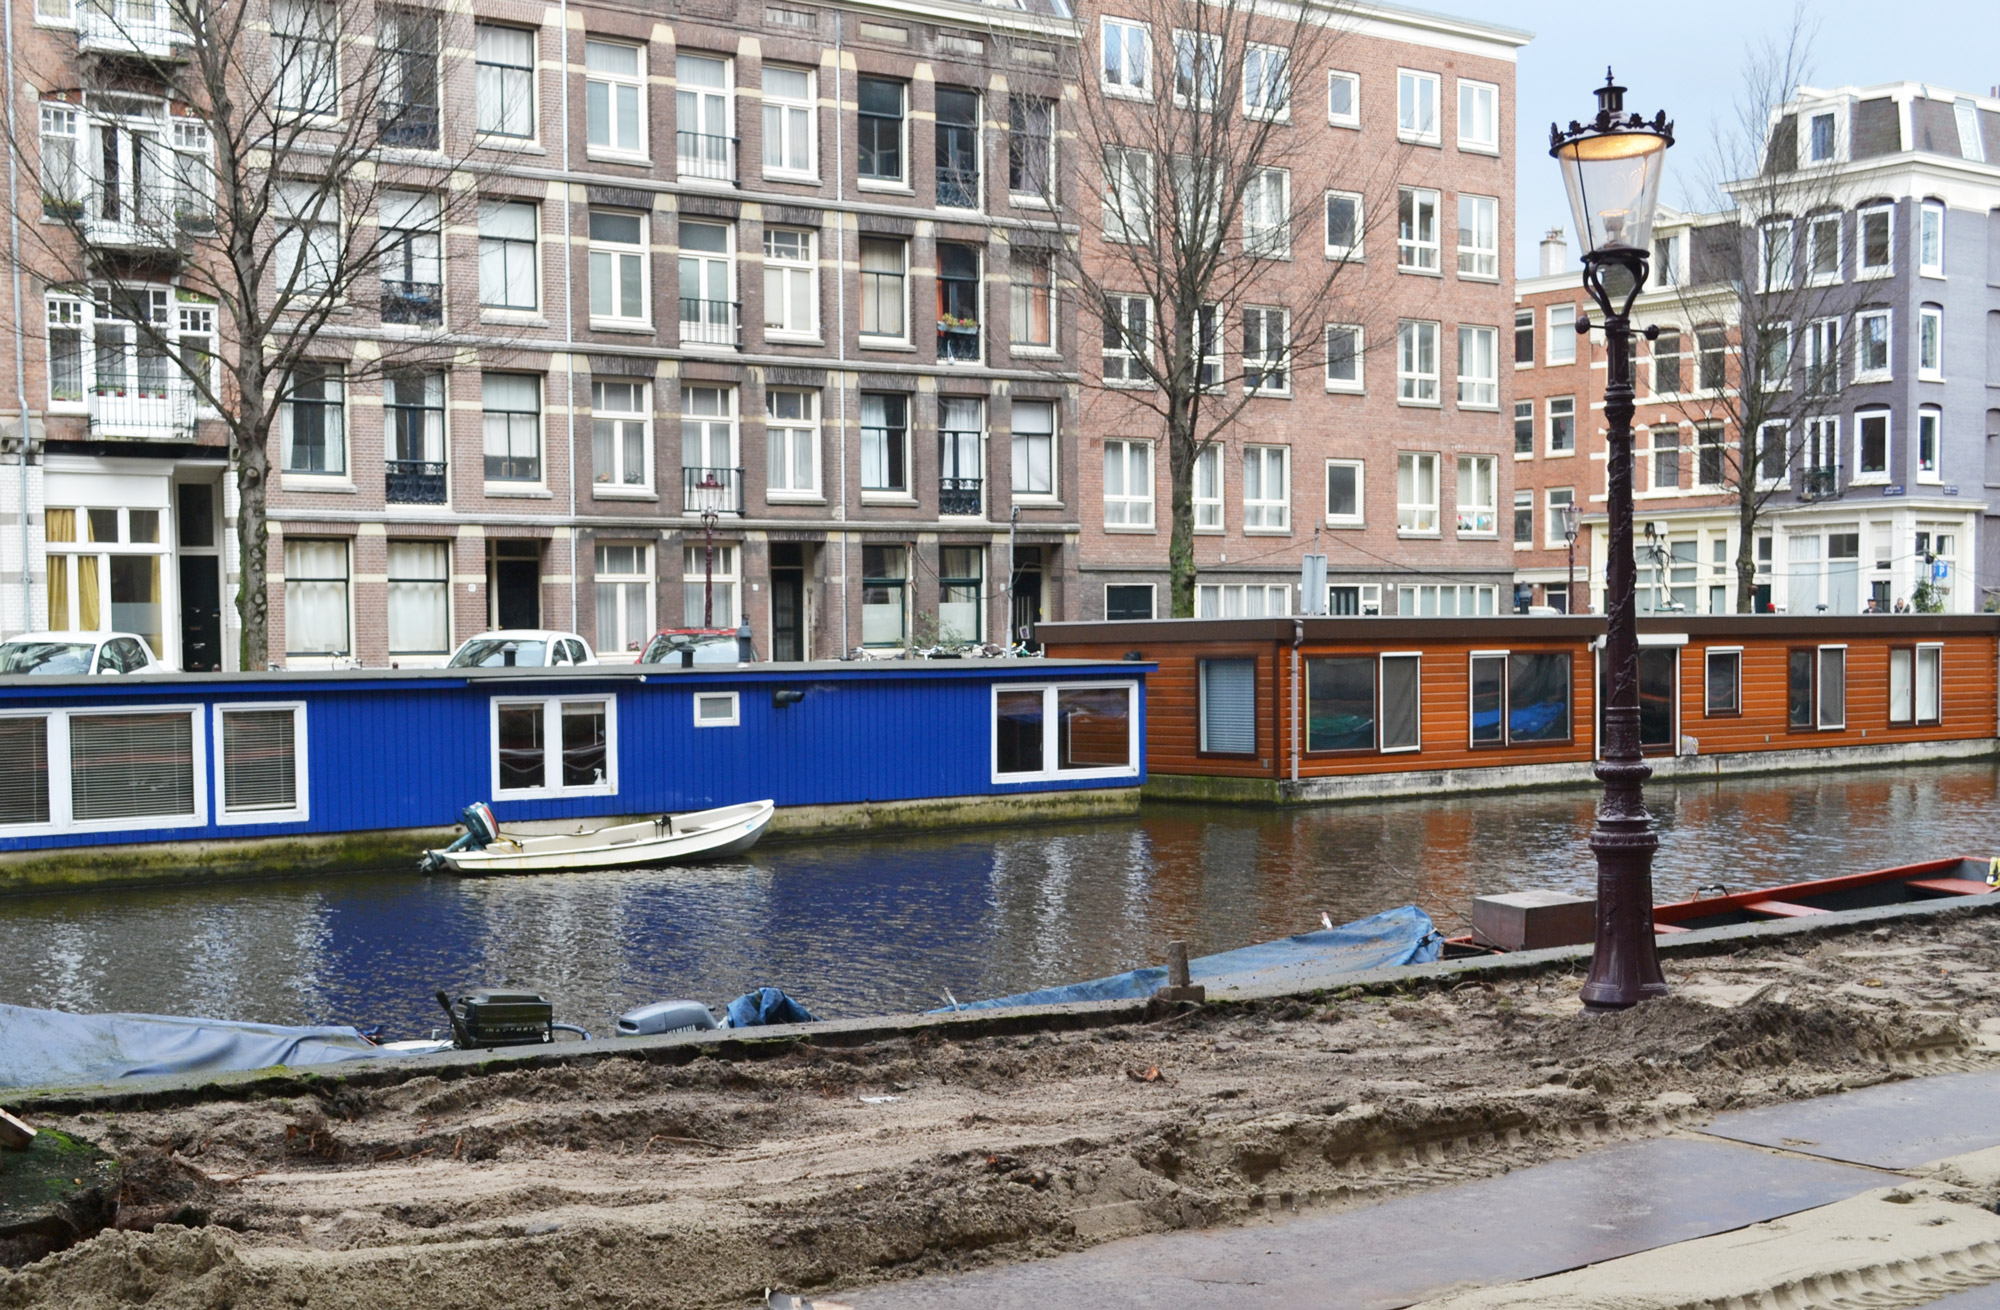 urbanbacklog-amsterdam-canal-houses-3.jpg